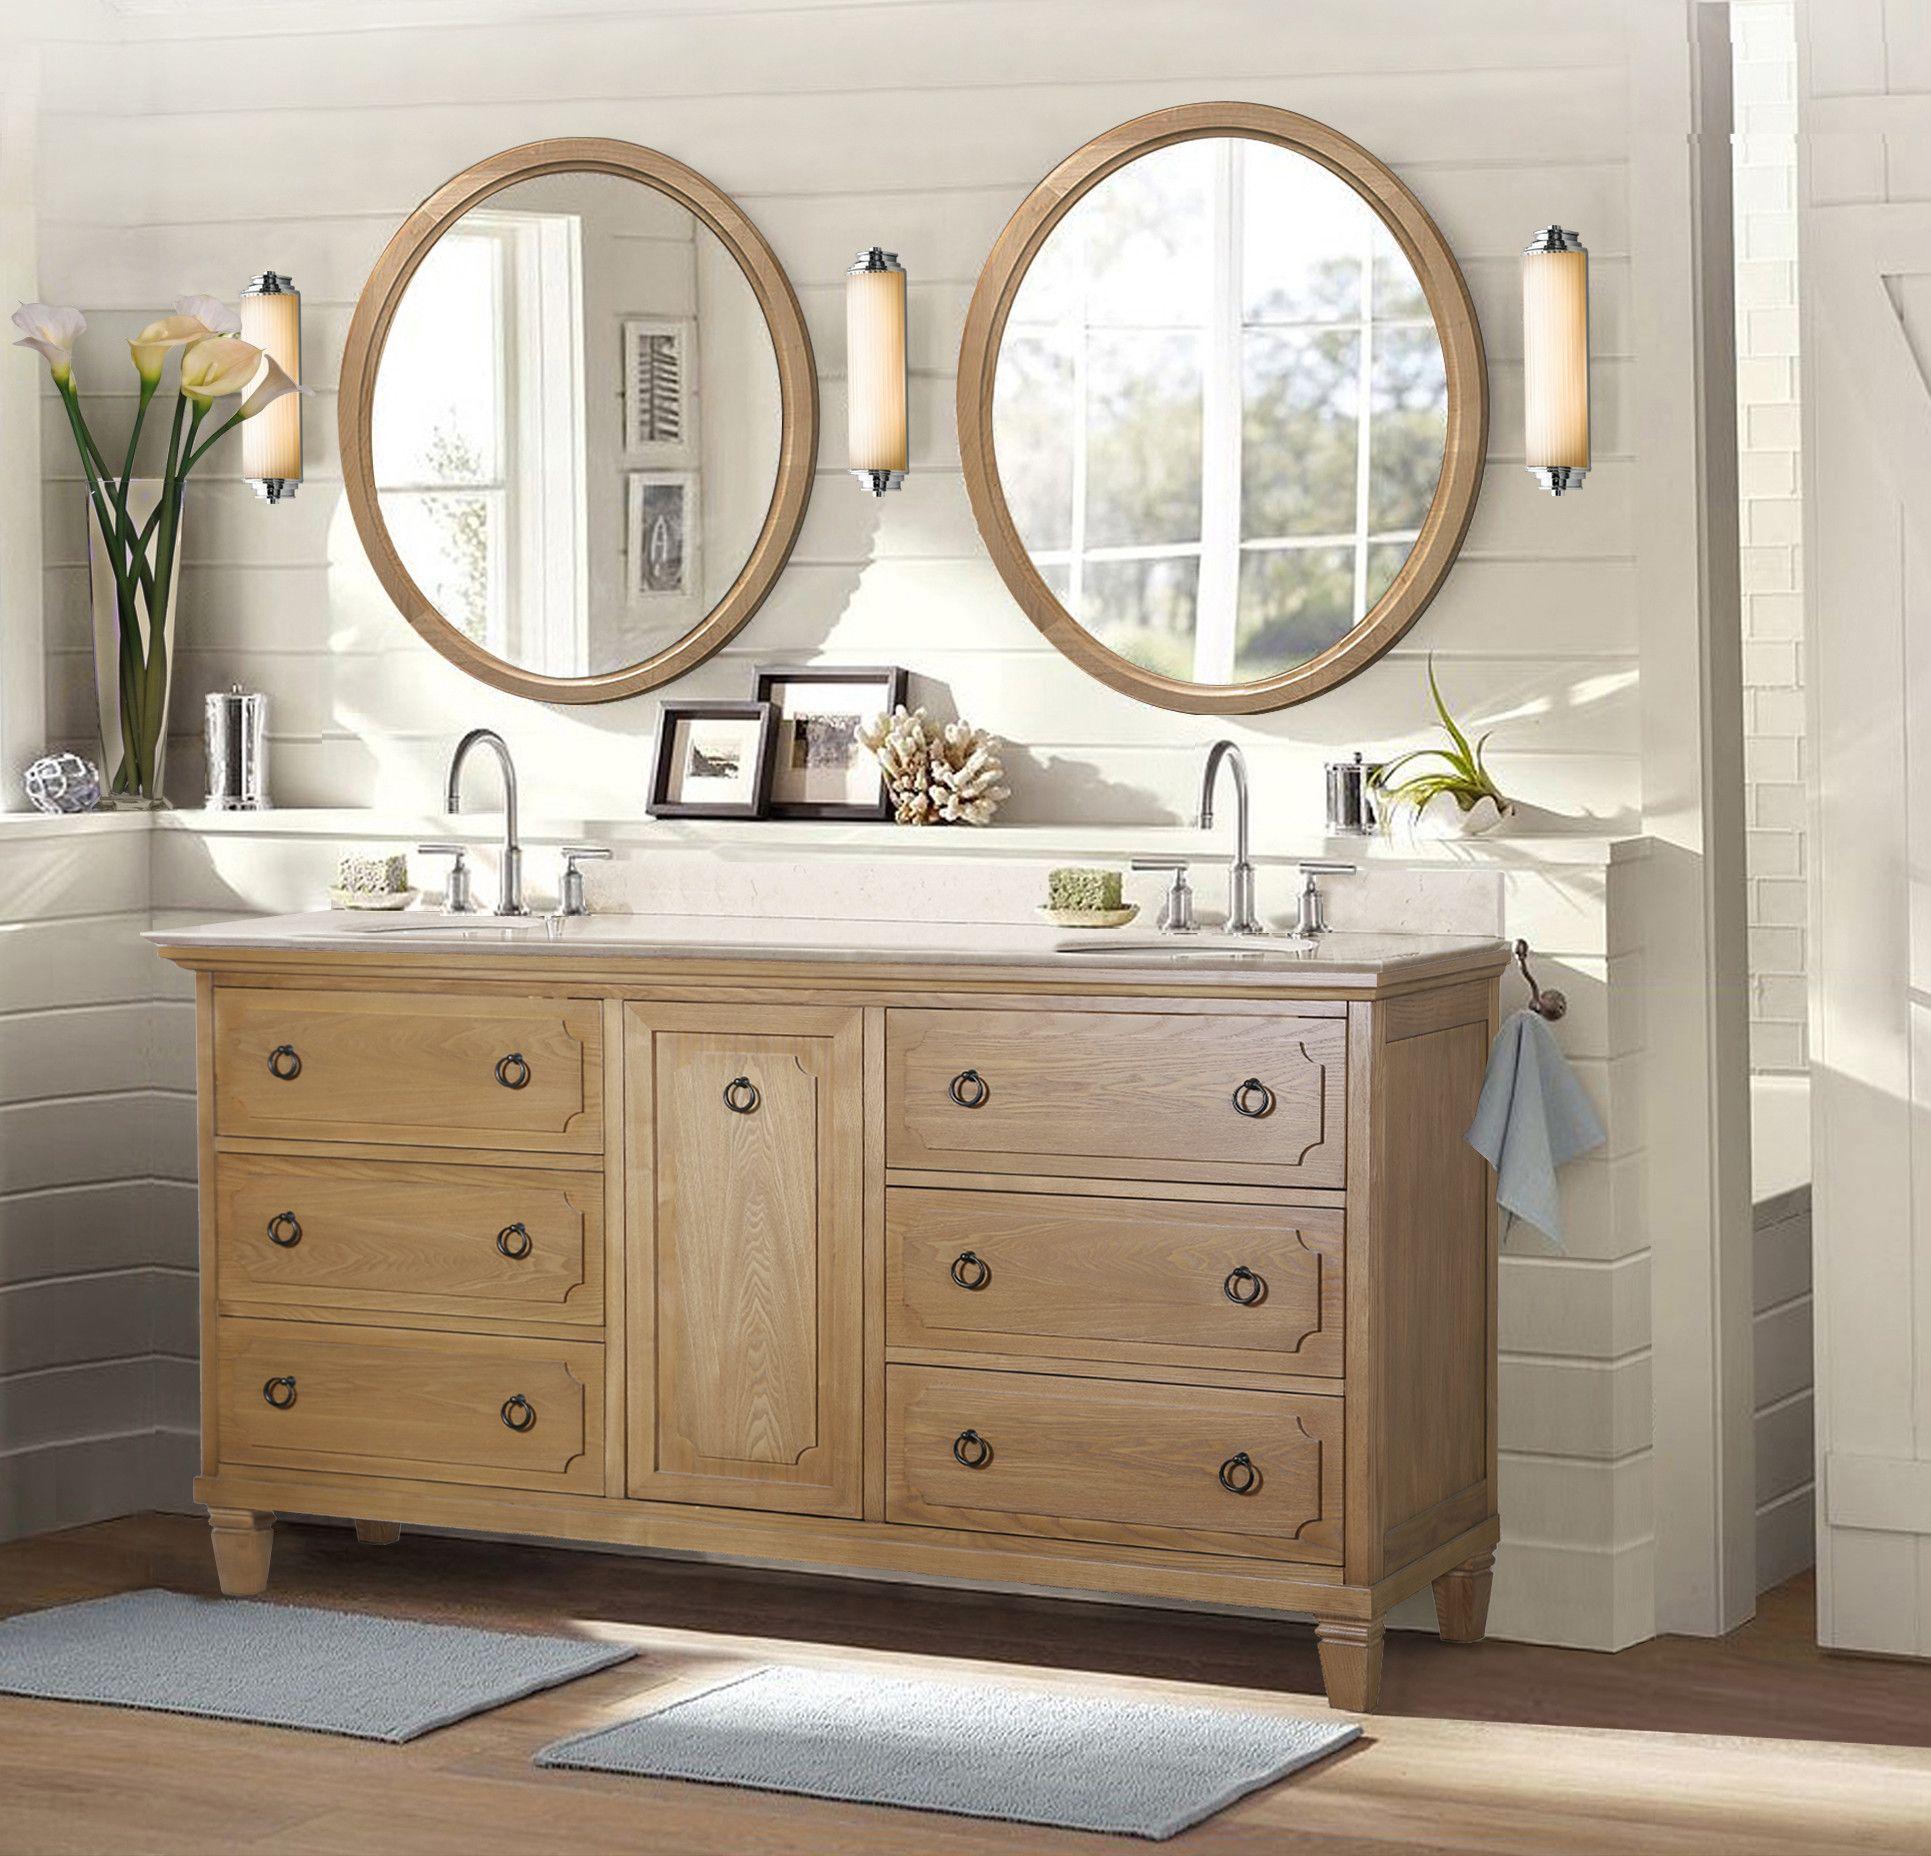 design vanity net leola set vanities bathroom sink dcor surripui double